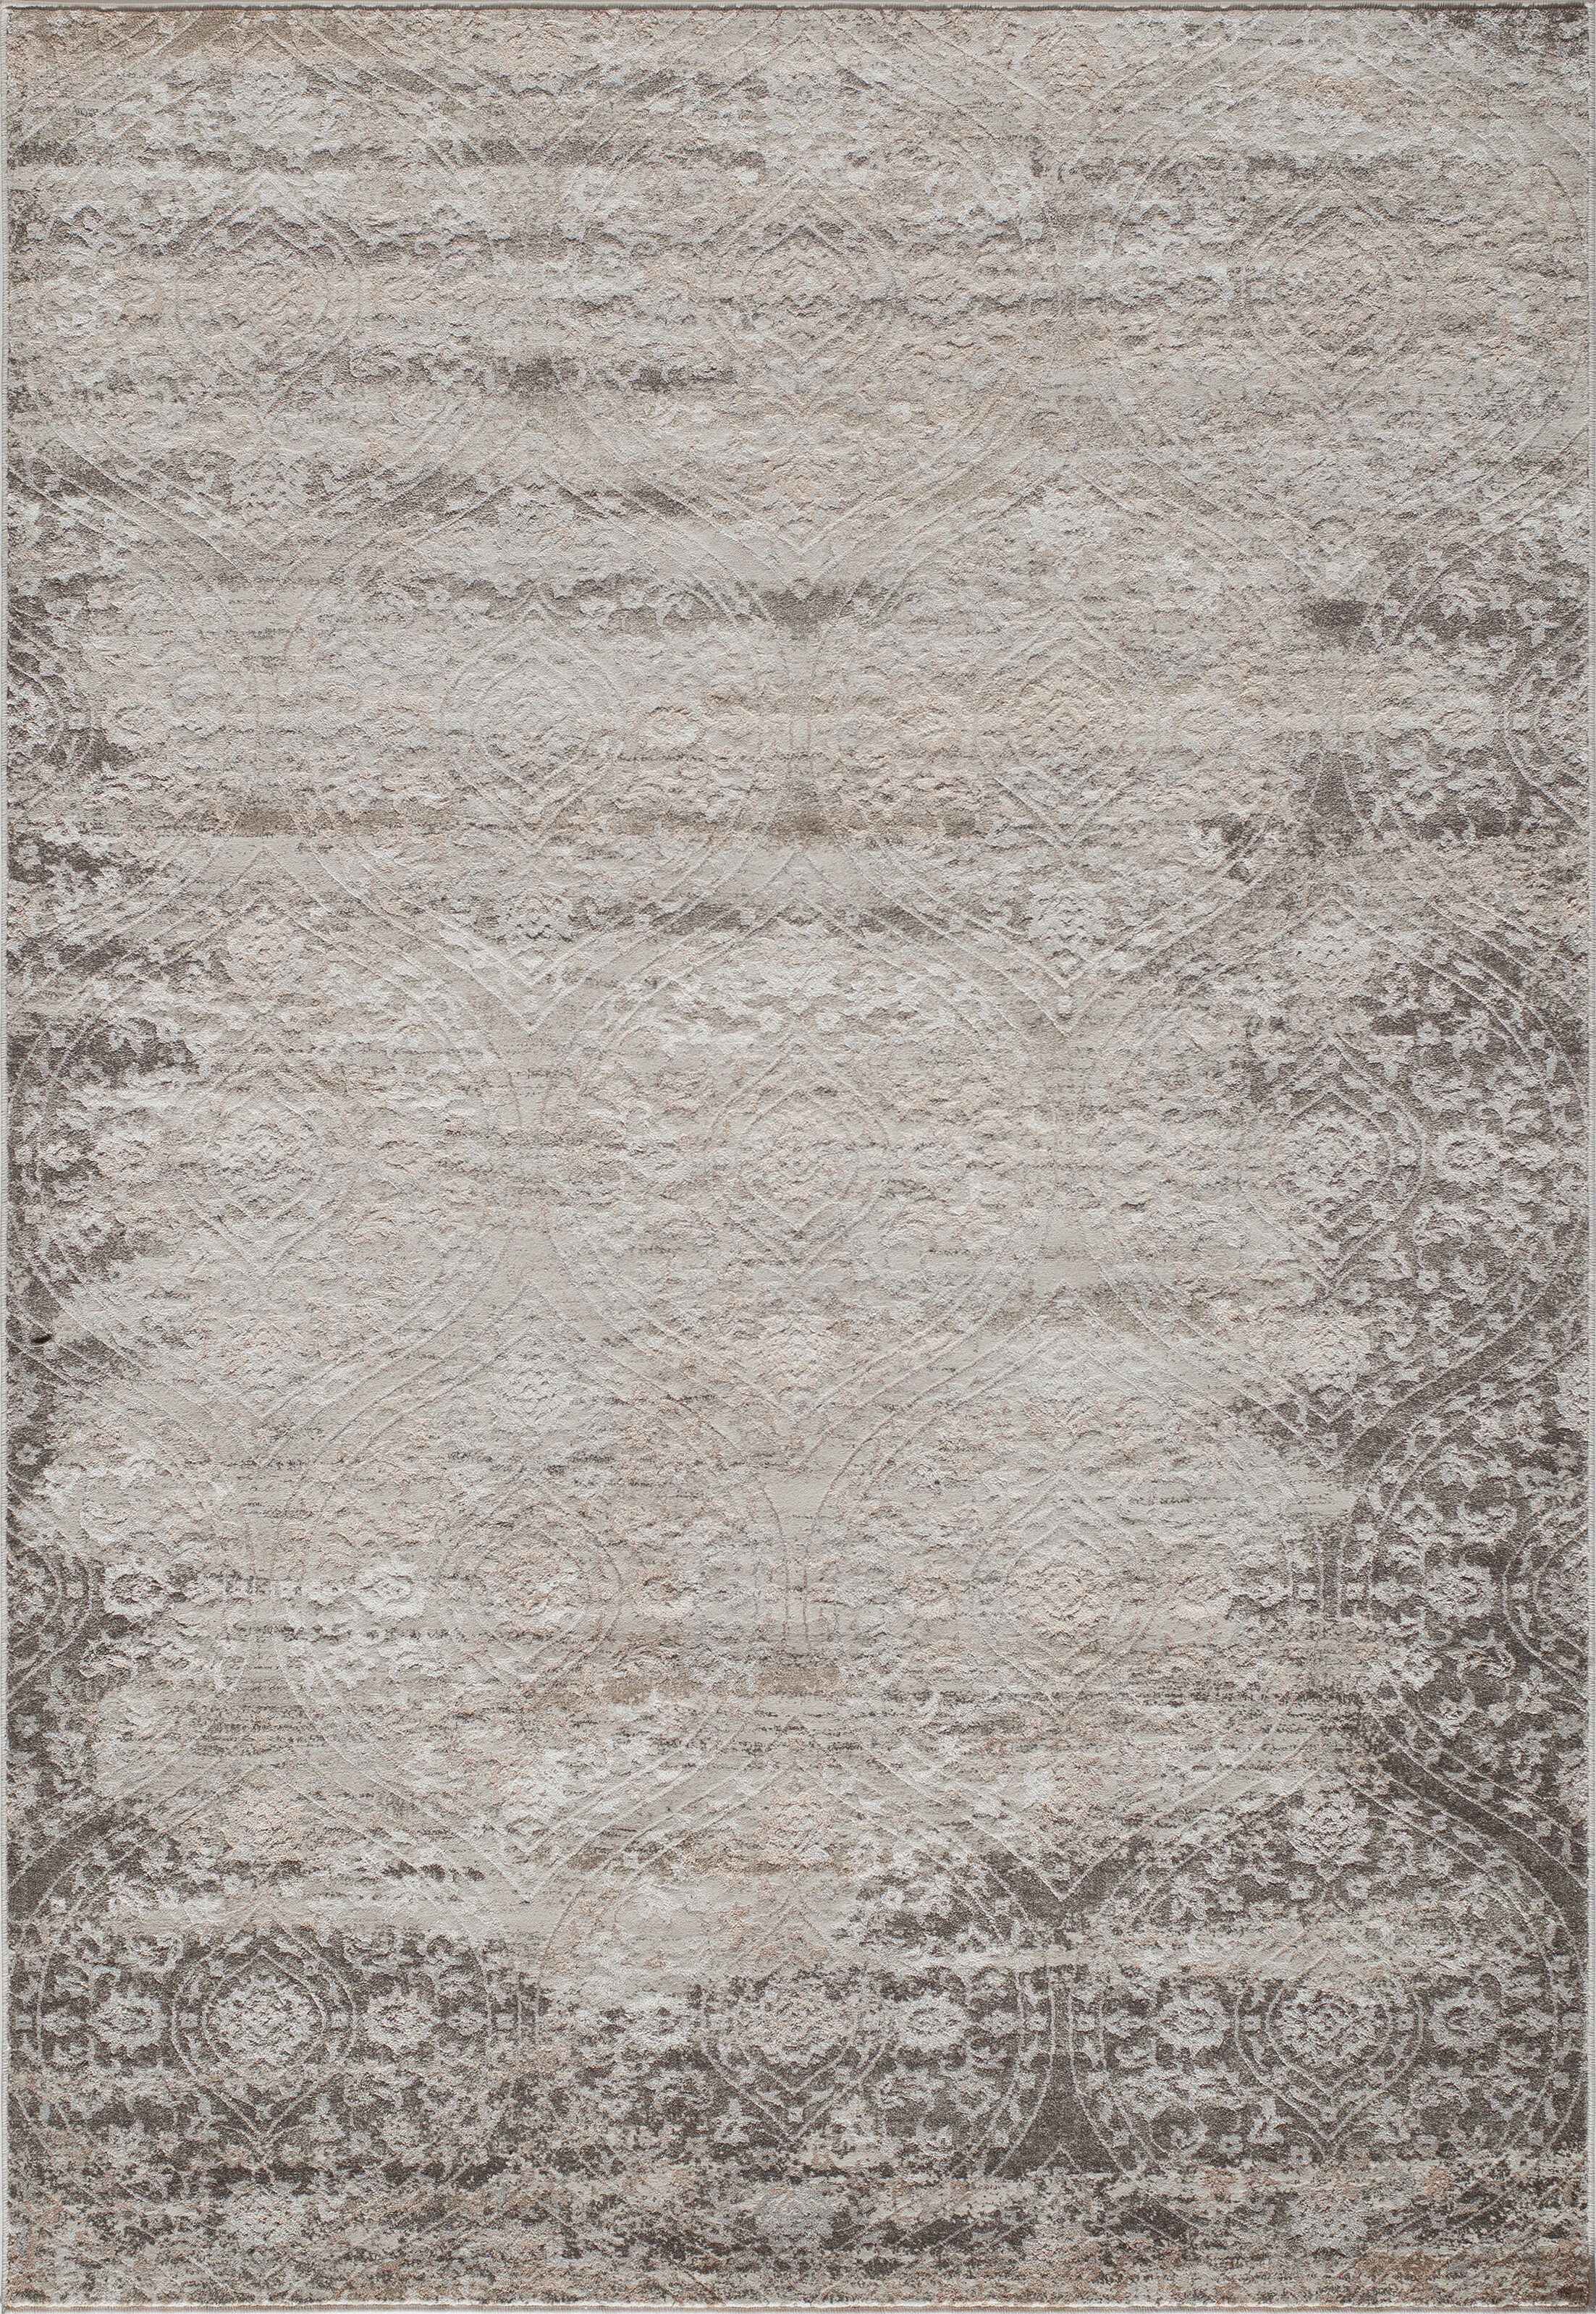 Autrey Ivory Area Rug Rug Size: Rectangle 3'3